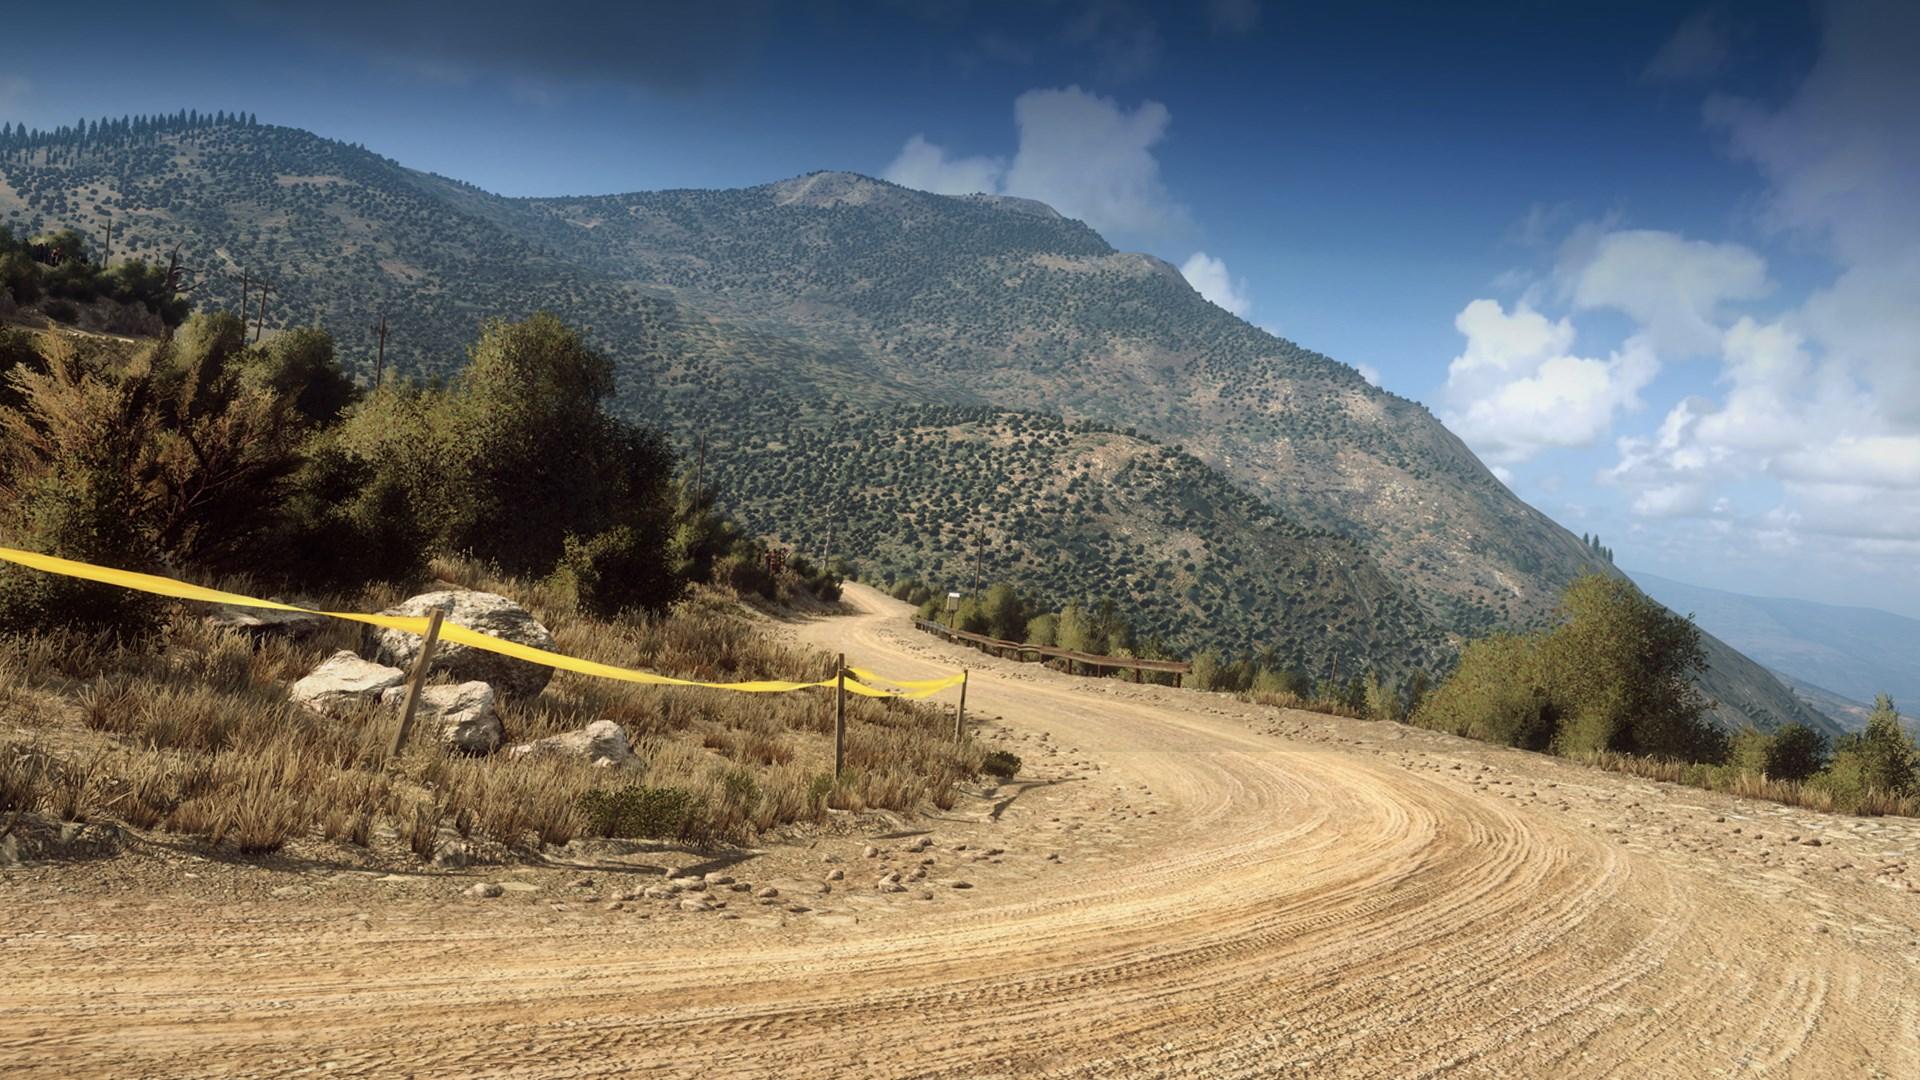 WS - Greece (Rally Location)